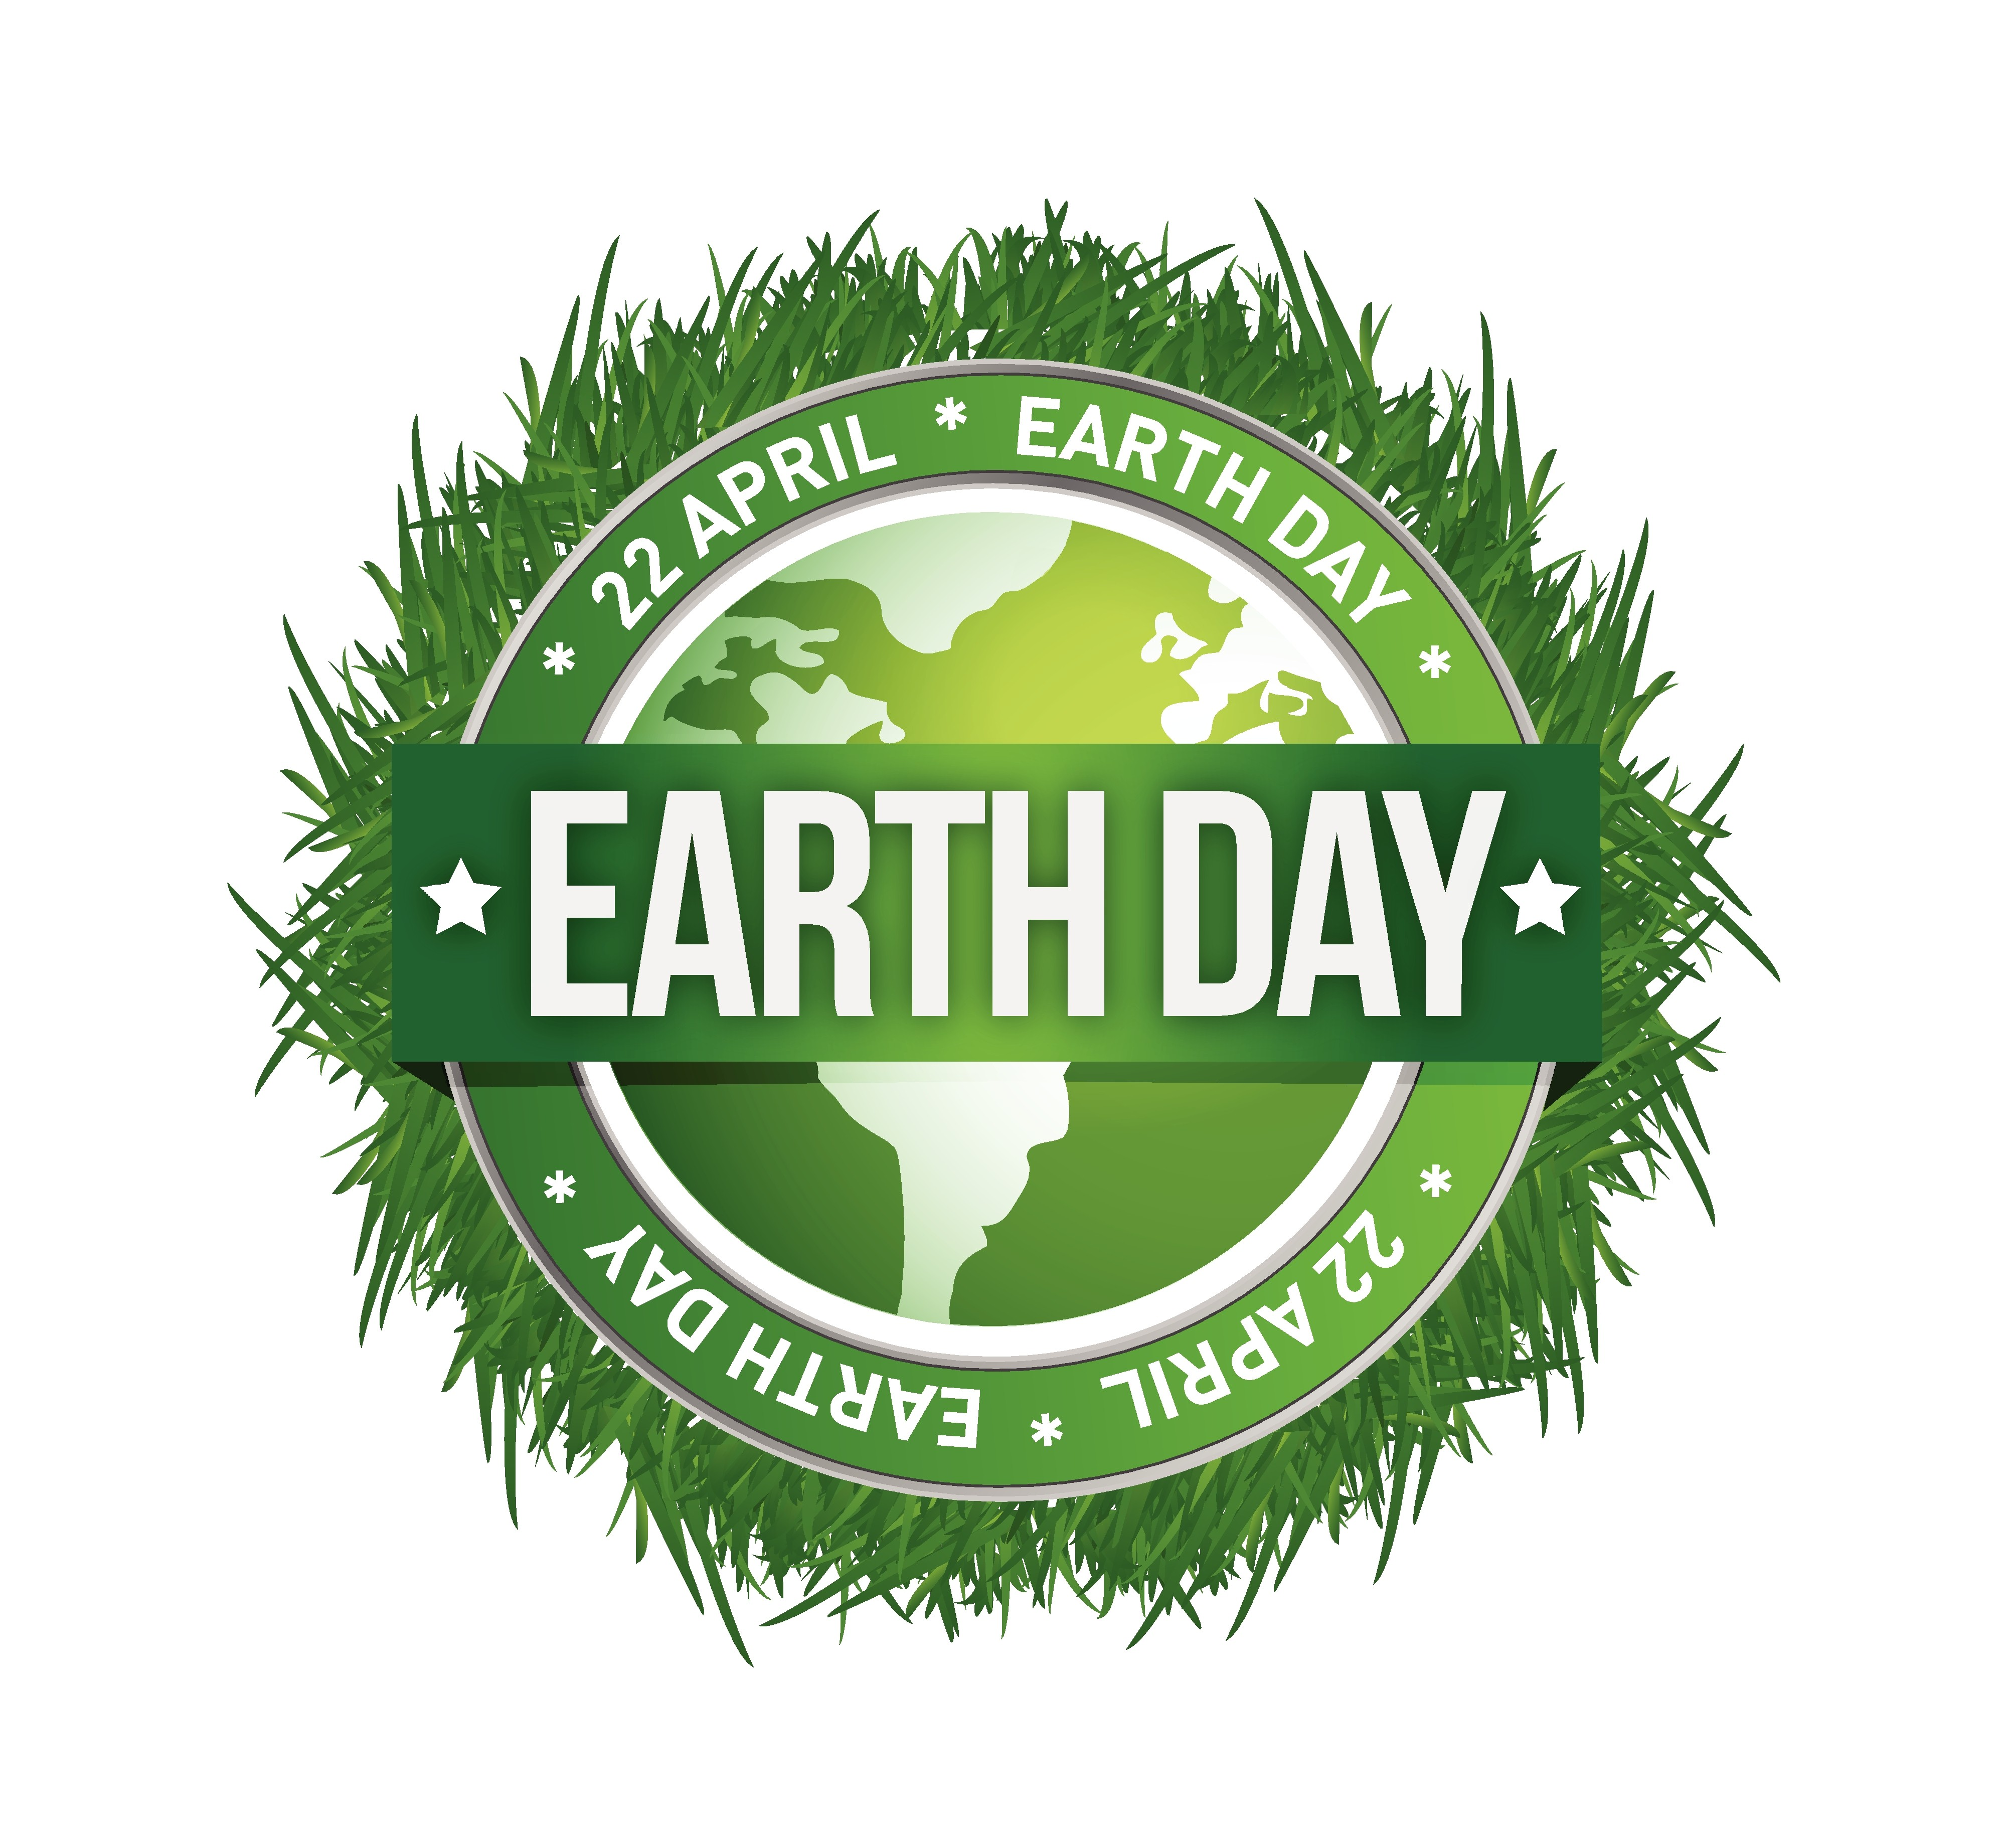 Favorite Celebrates Earth Day 2015